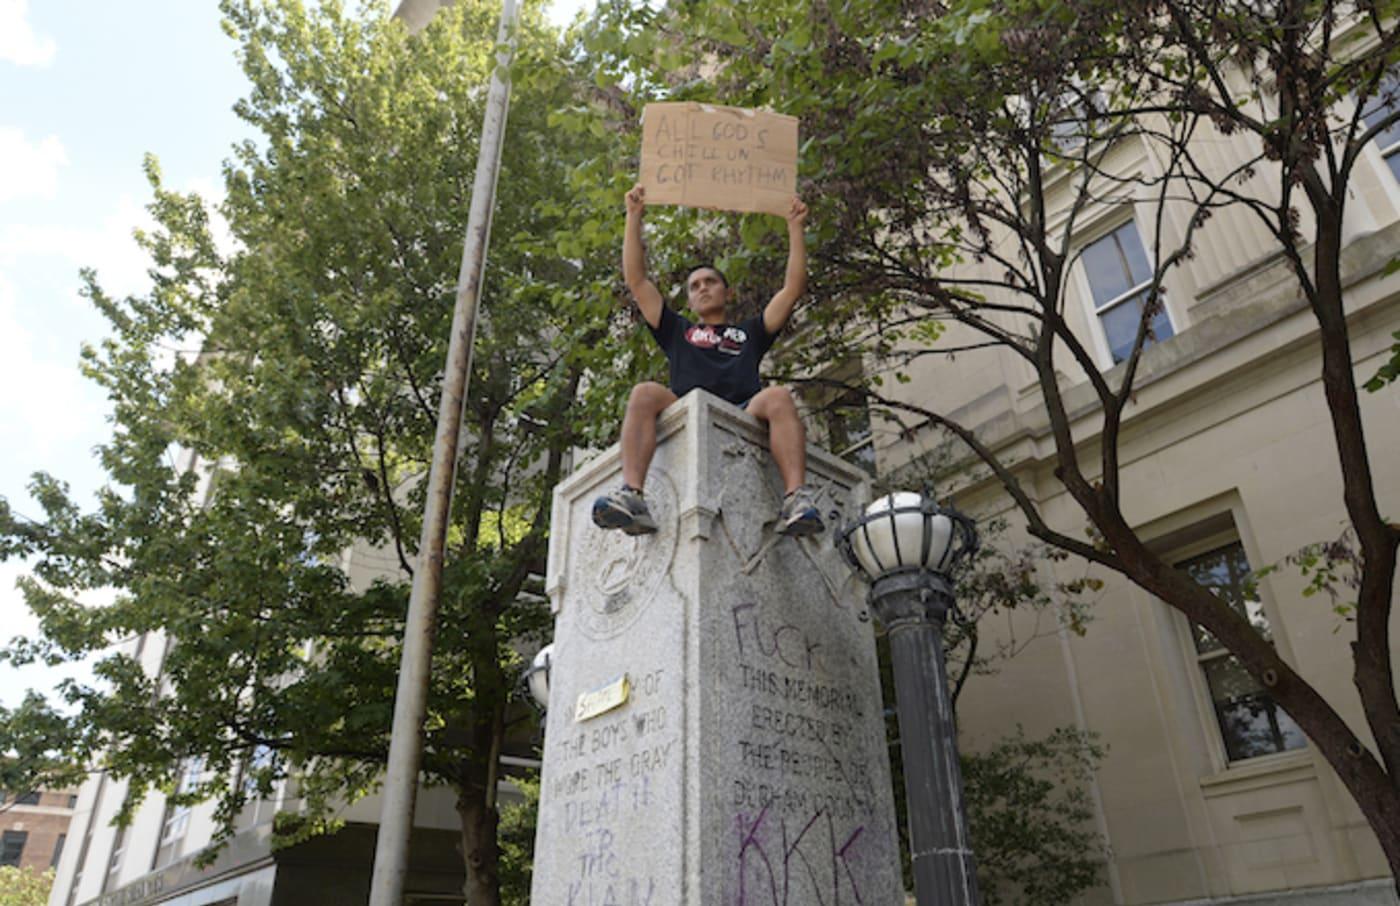 Demonstrator in Durham, North Carolina